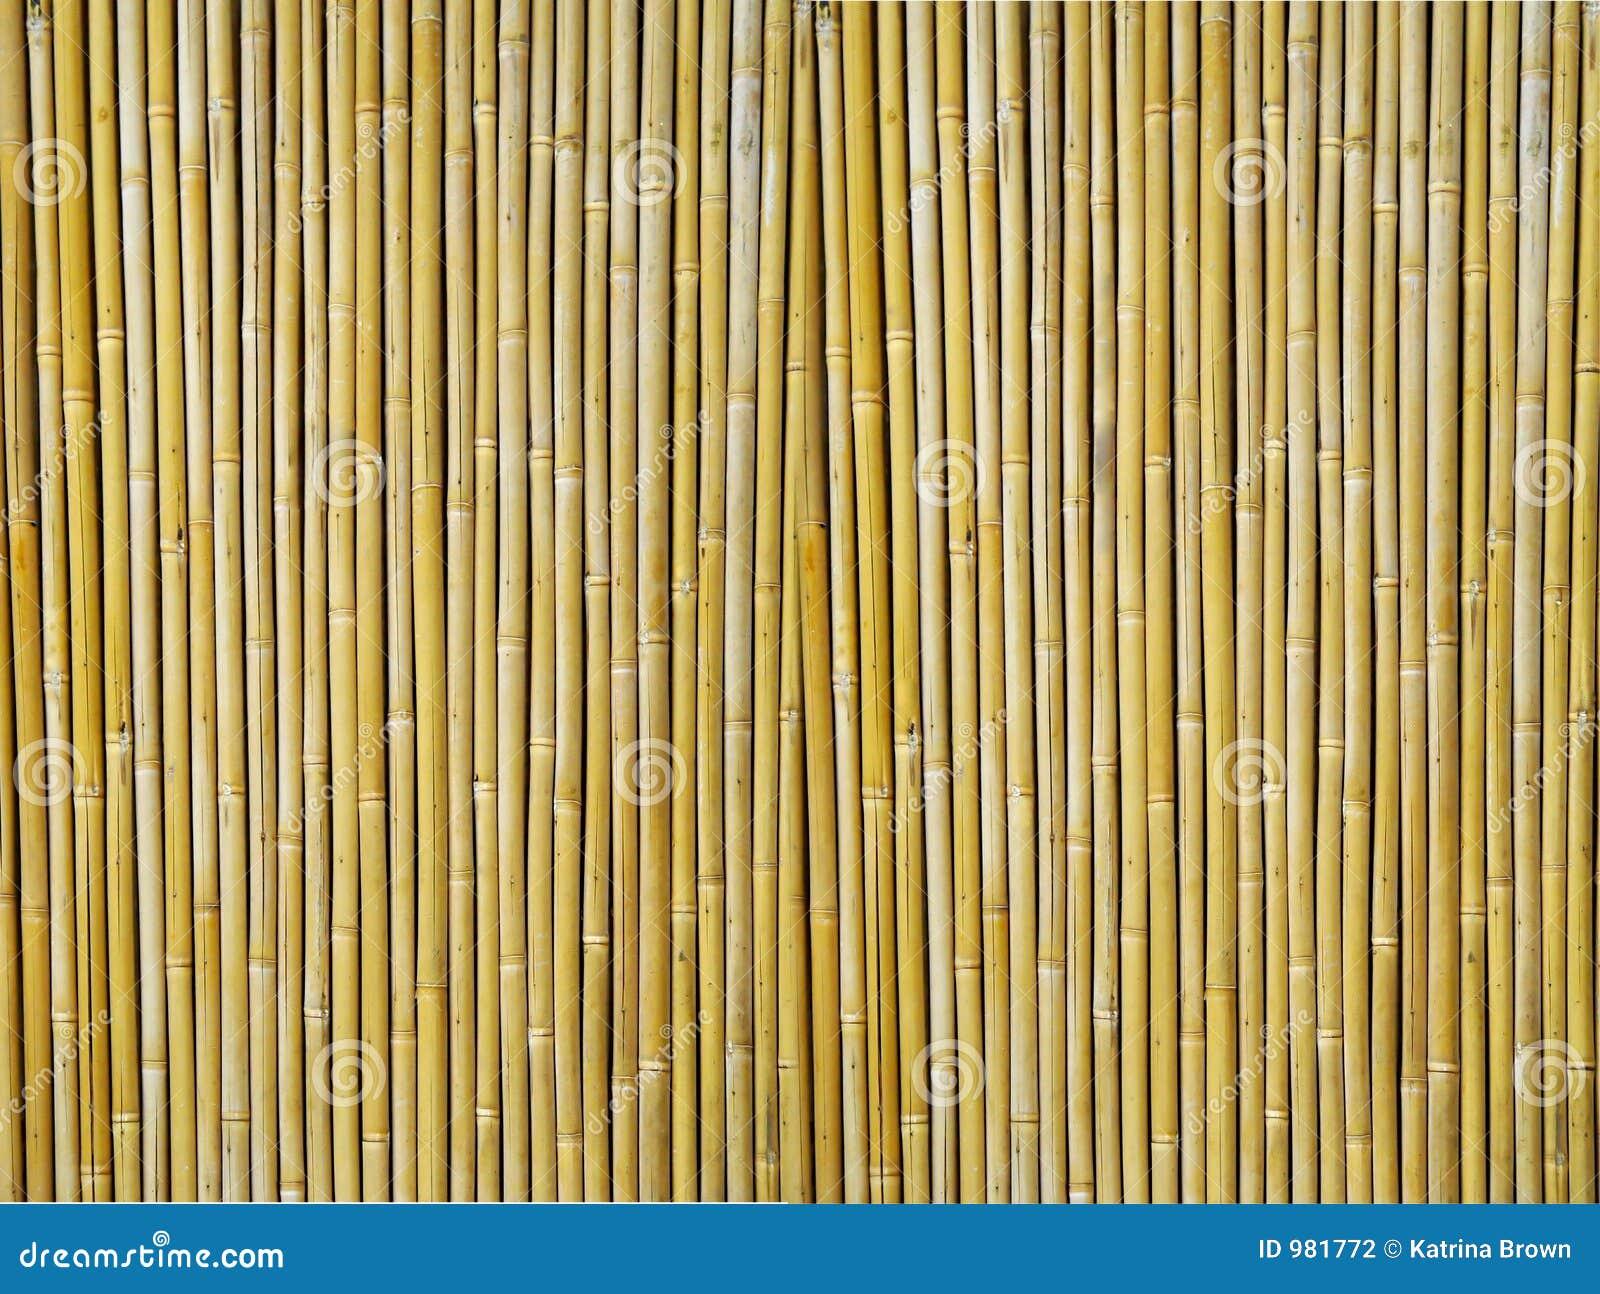 Bamboo Textured Background Stock Photo Image Of Closeup